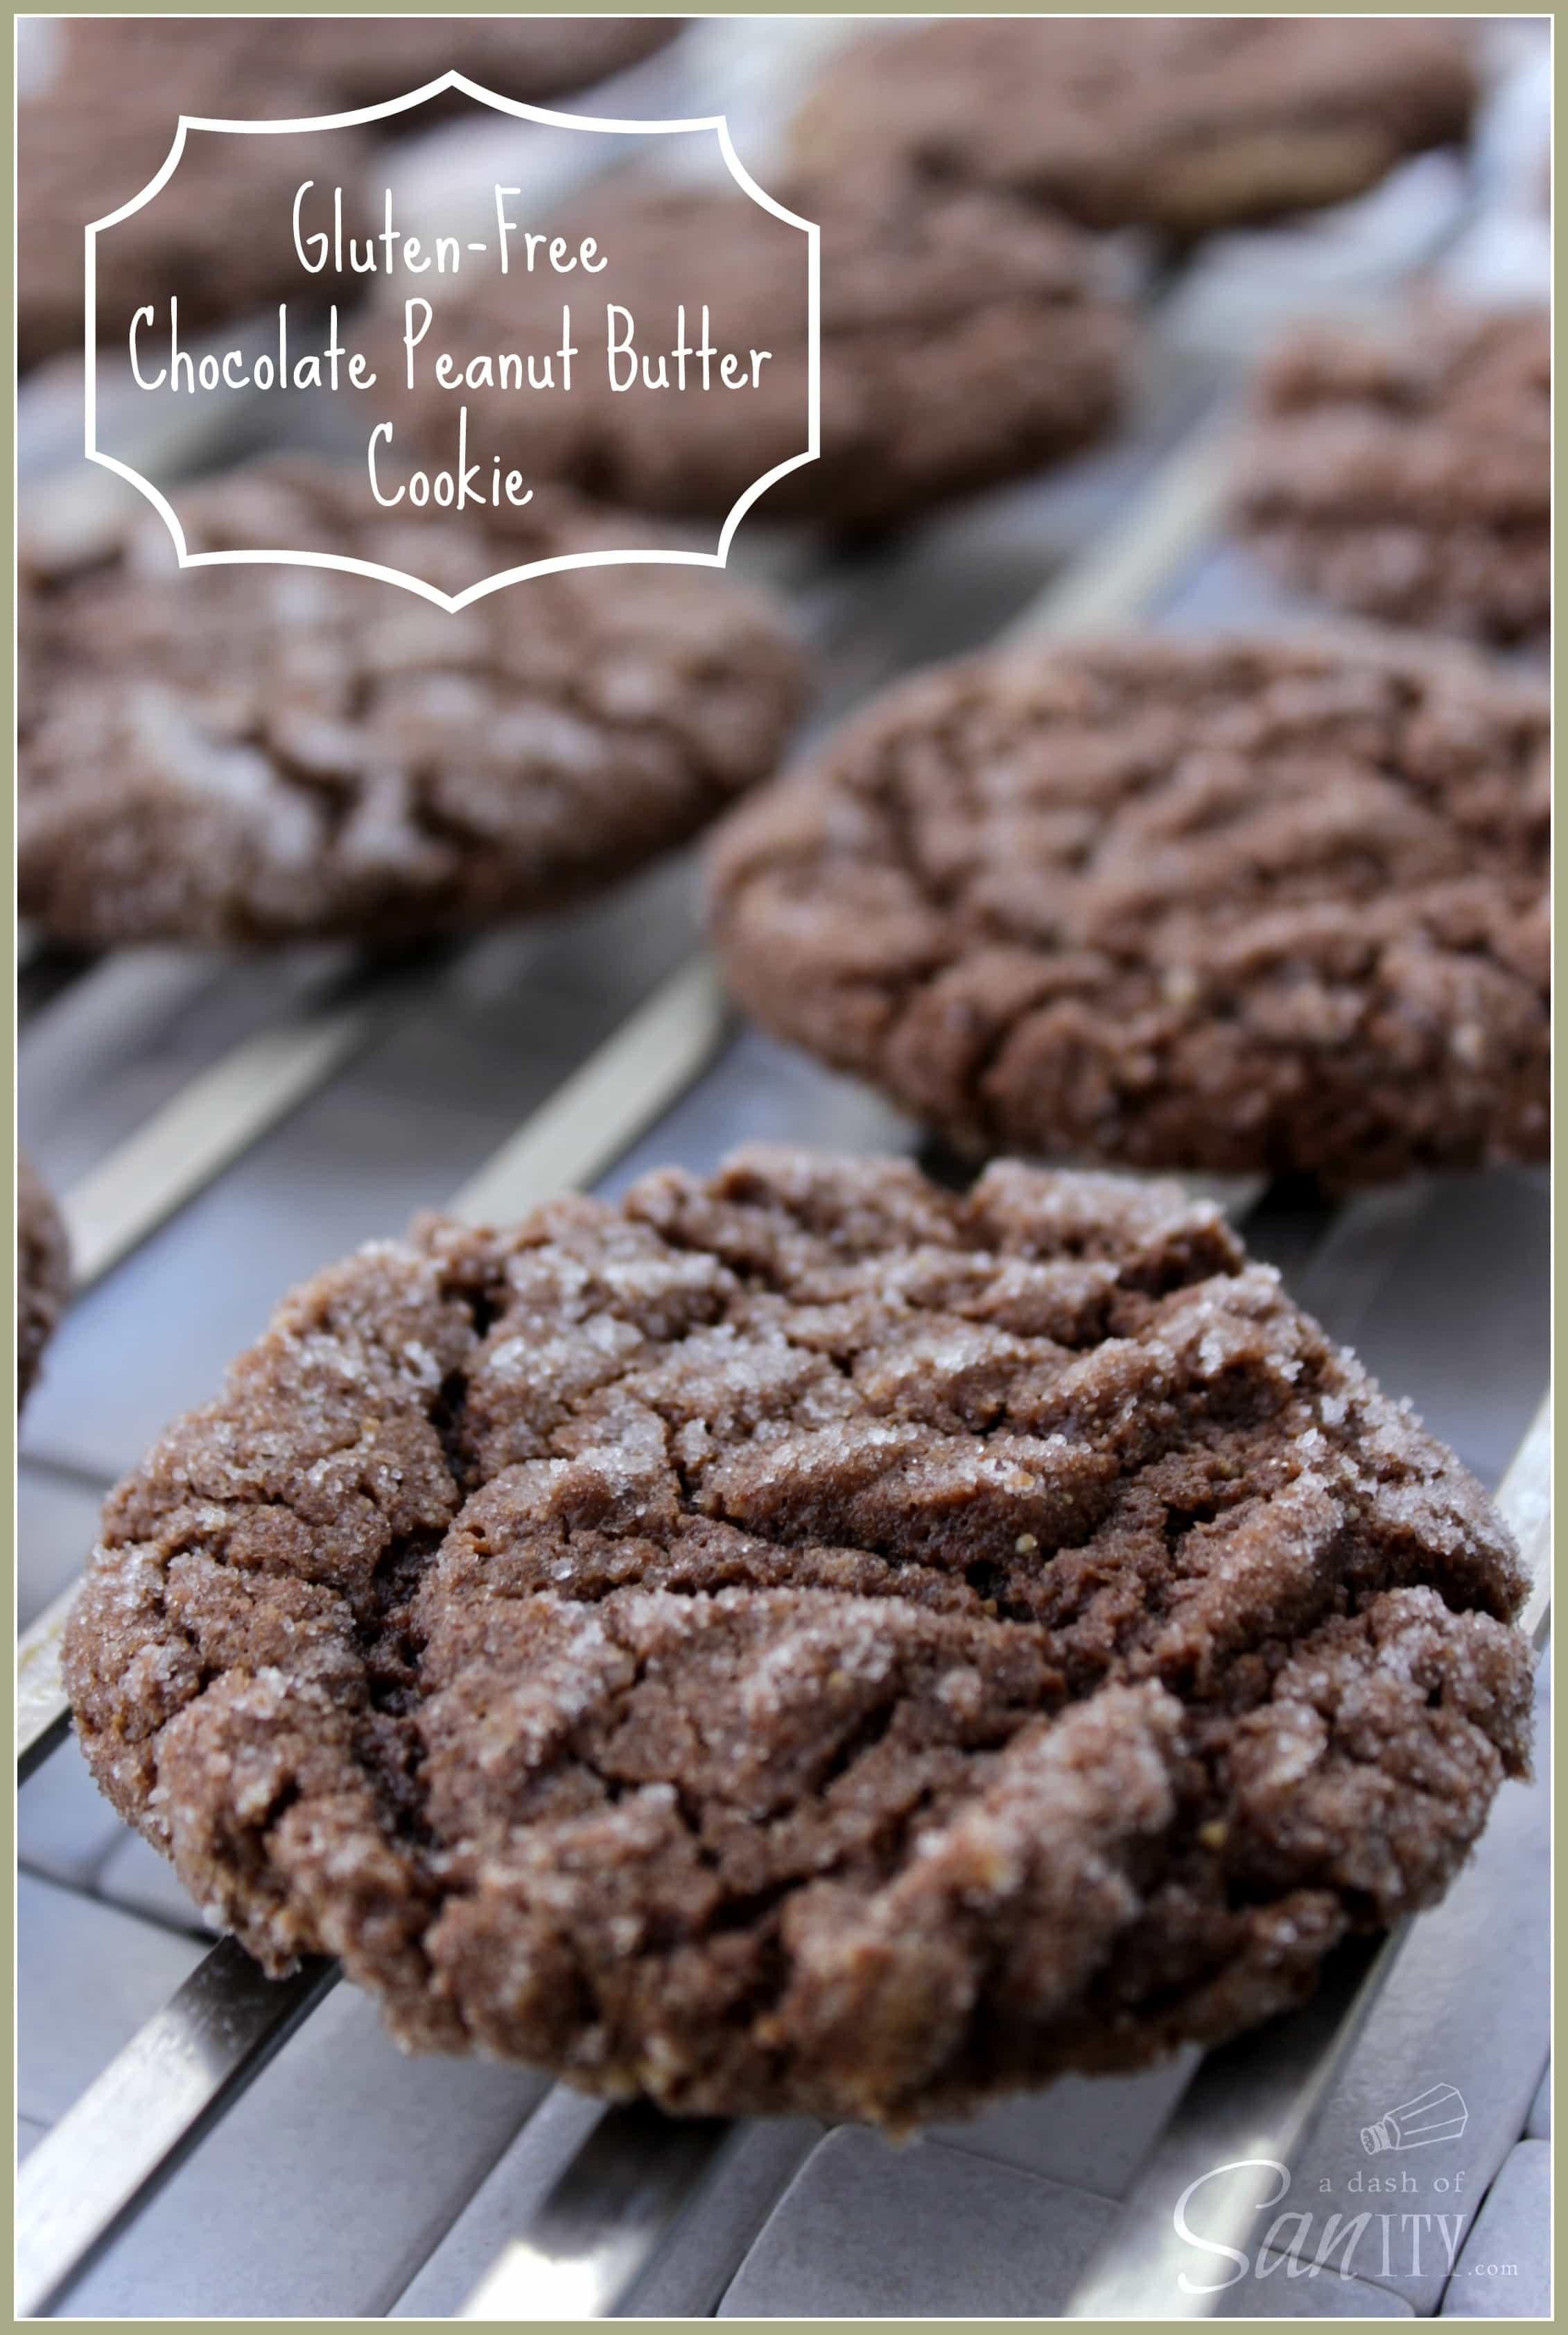 Gluten Free Peanut Butter Cookies  Gluten Free Chocolate Peanut Butter Cookies A Dash of Sanity